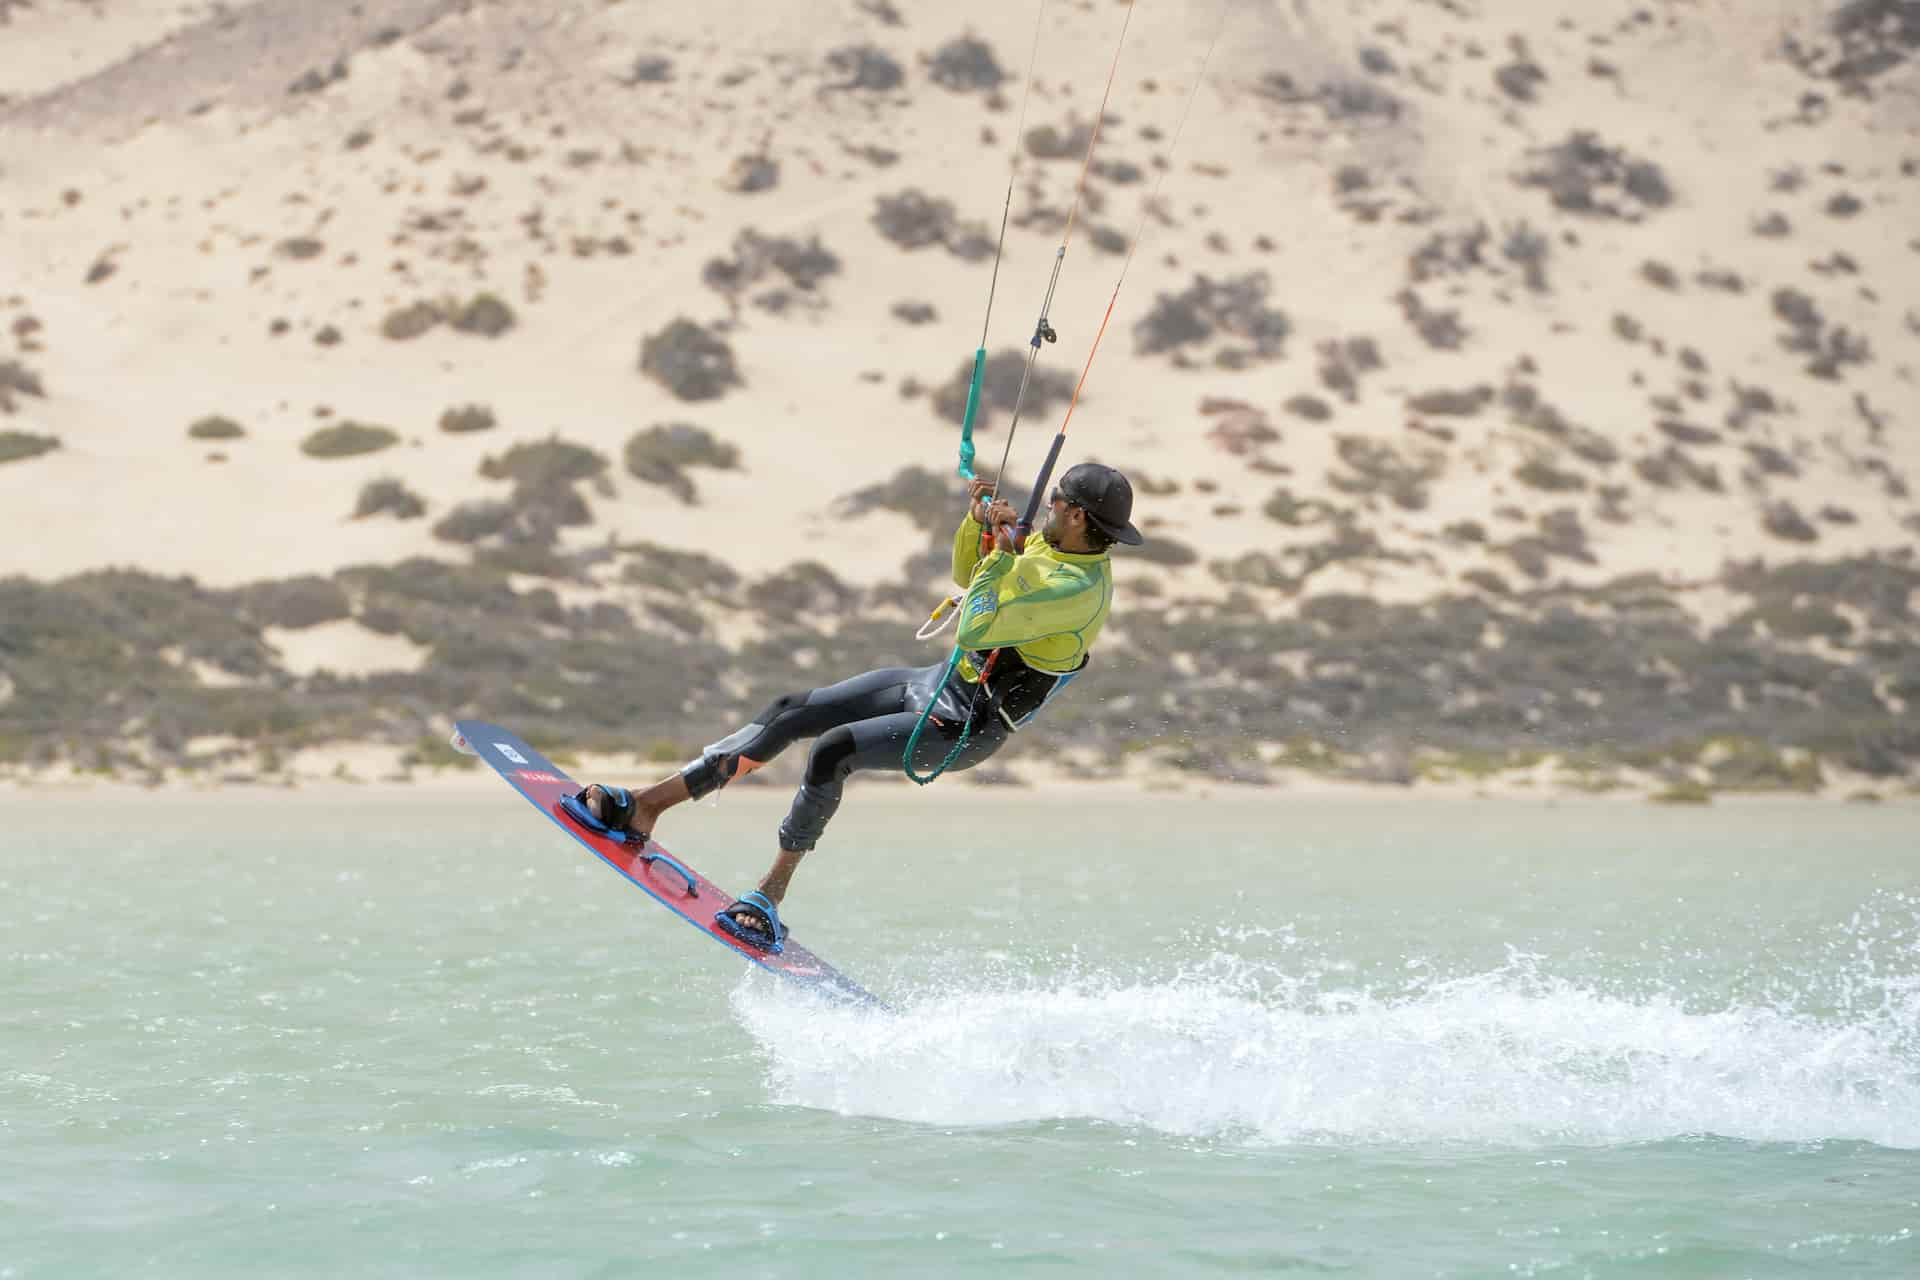 Kitesurf perfectionnement